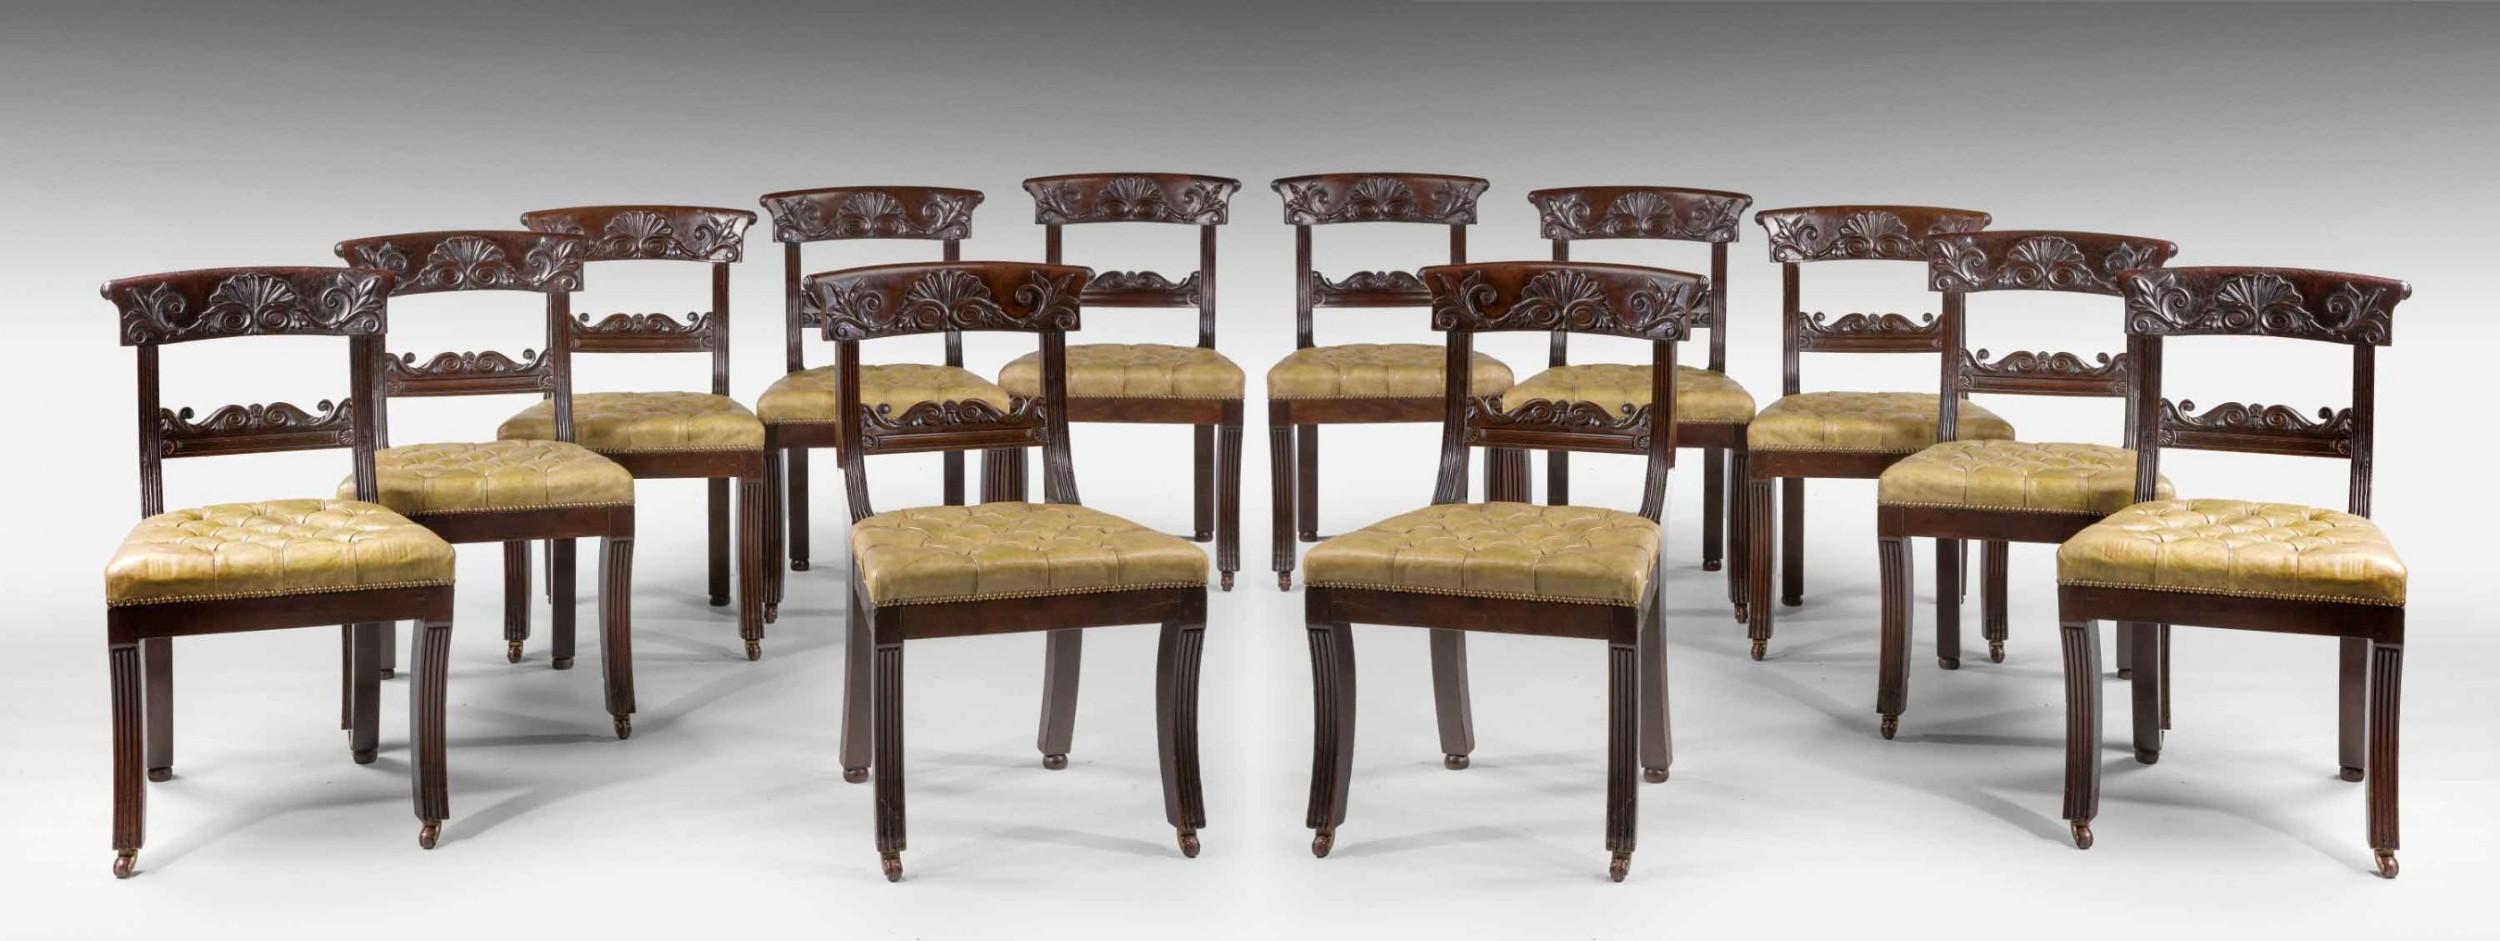 set of twelve regency period mahogany dininglibrary chairs